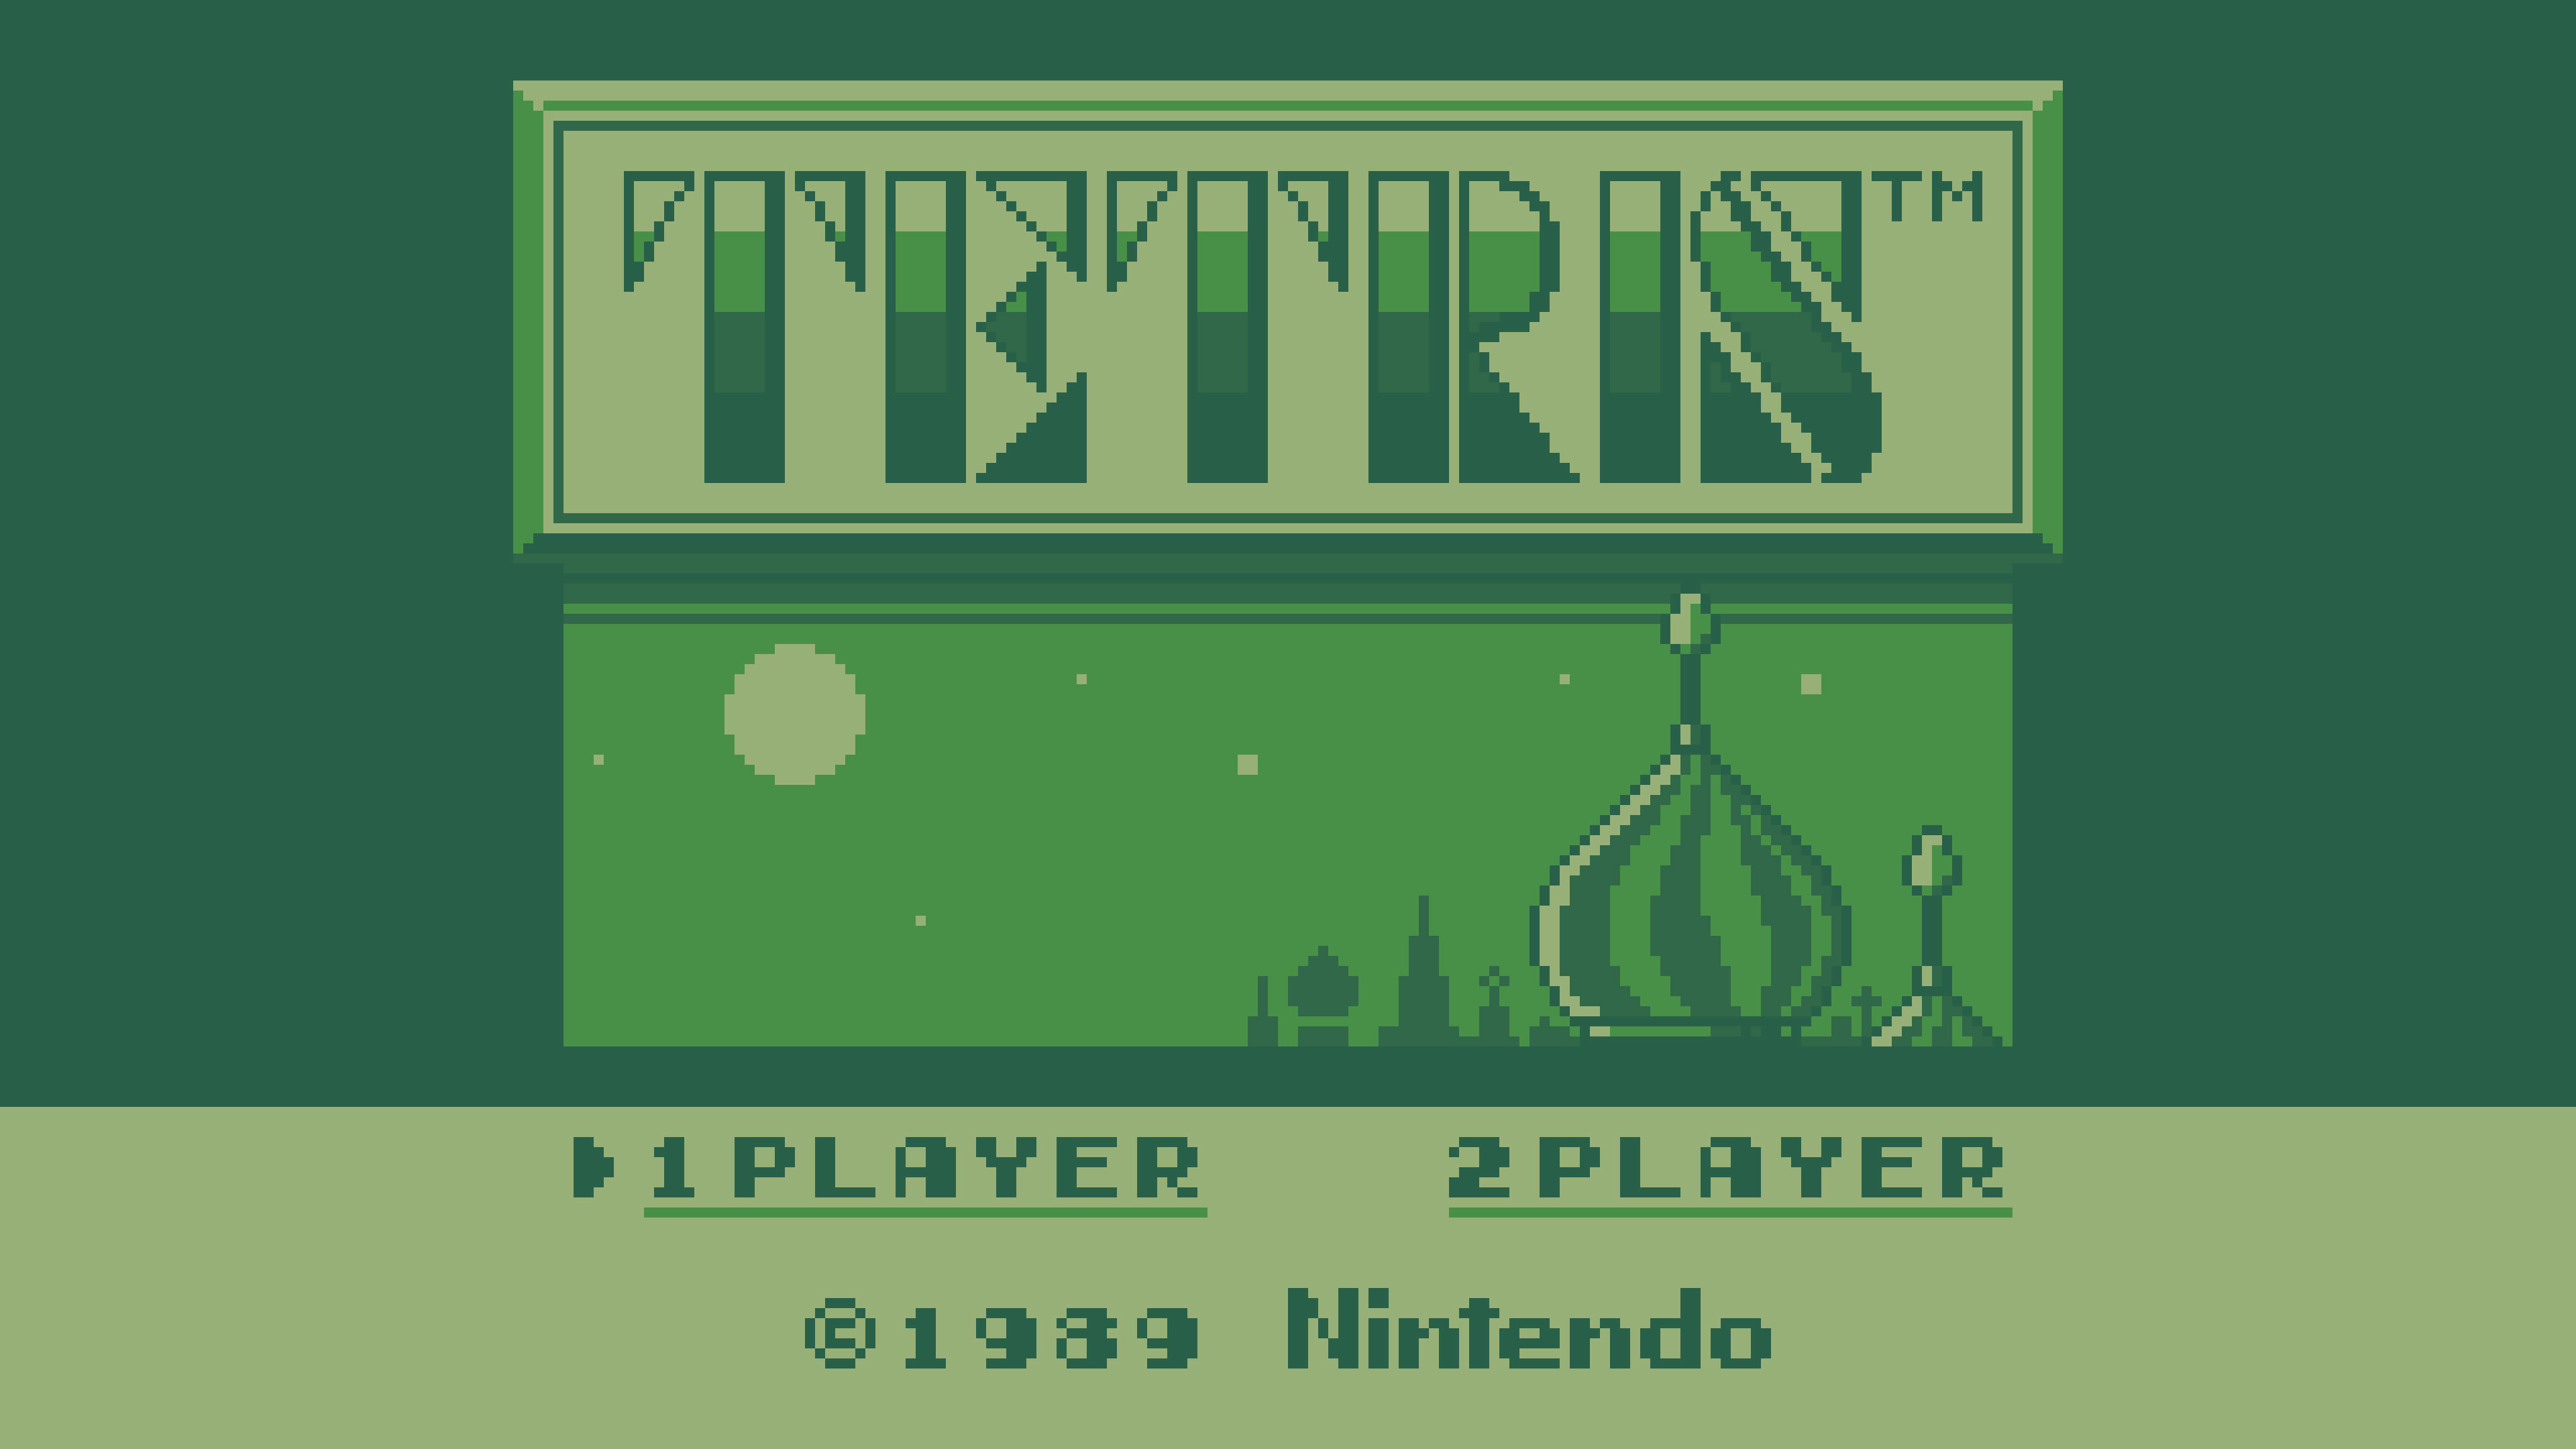 Tetris Wallpapers 3840x2160 Ultra Hd 4k Desktop Backgrounds